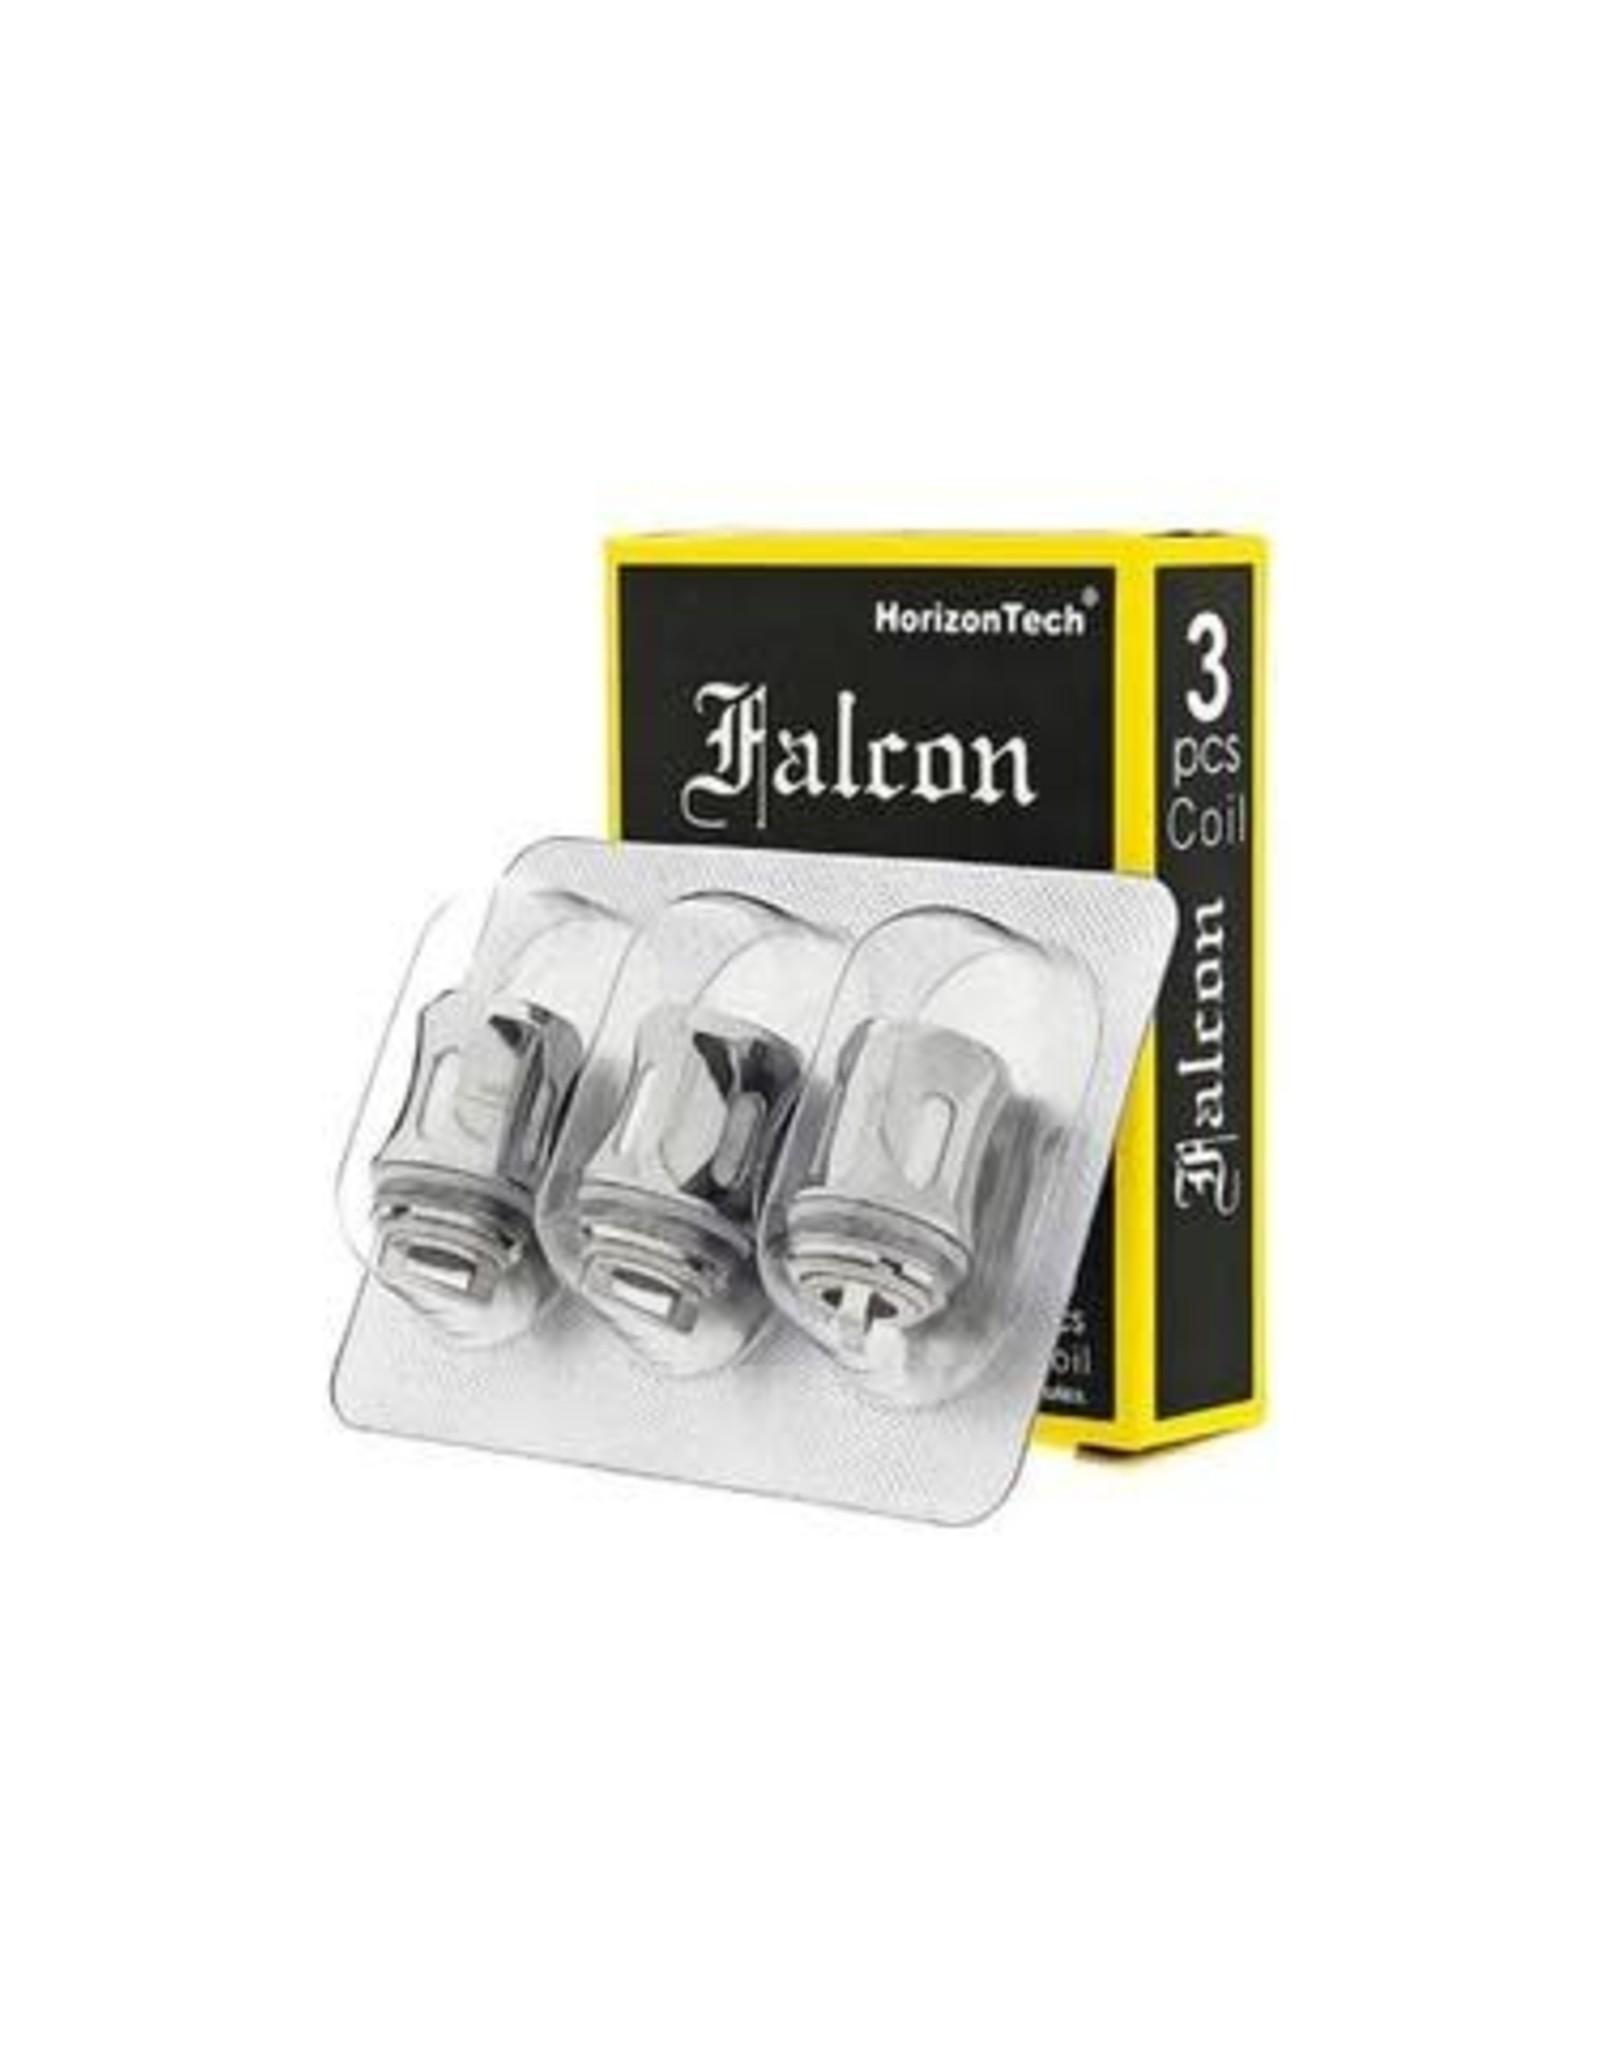 HORIZON TECH FALCON COILS (3 PACK)